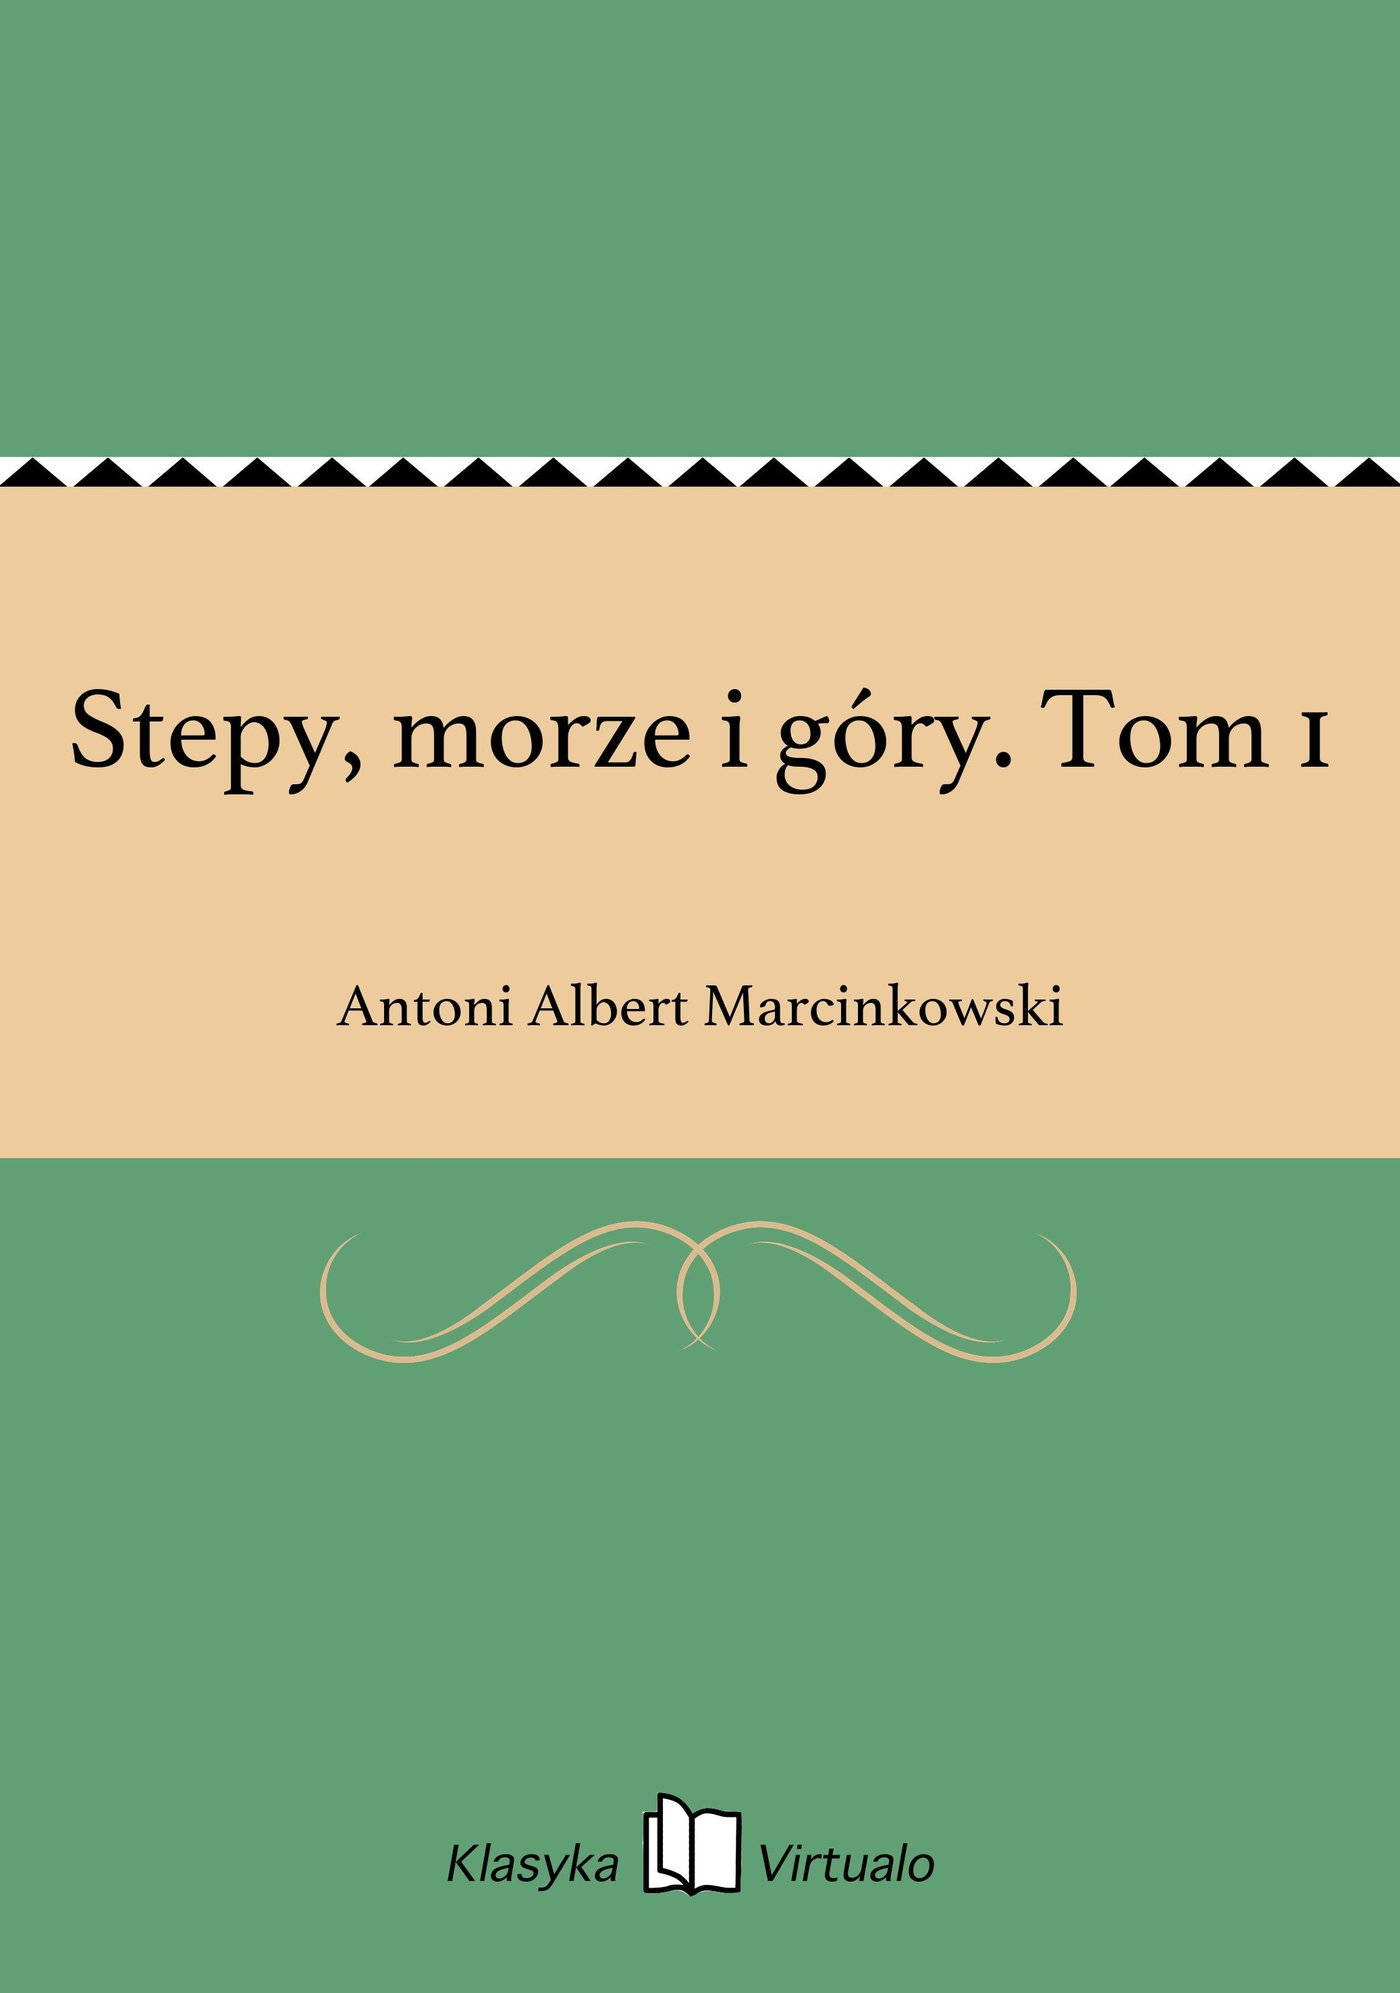 Stepy, morze i góry. Tom 1 - Ebook (Książka EPUB) do pobrania w formacie EPUB